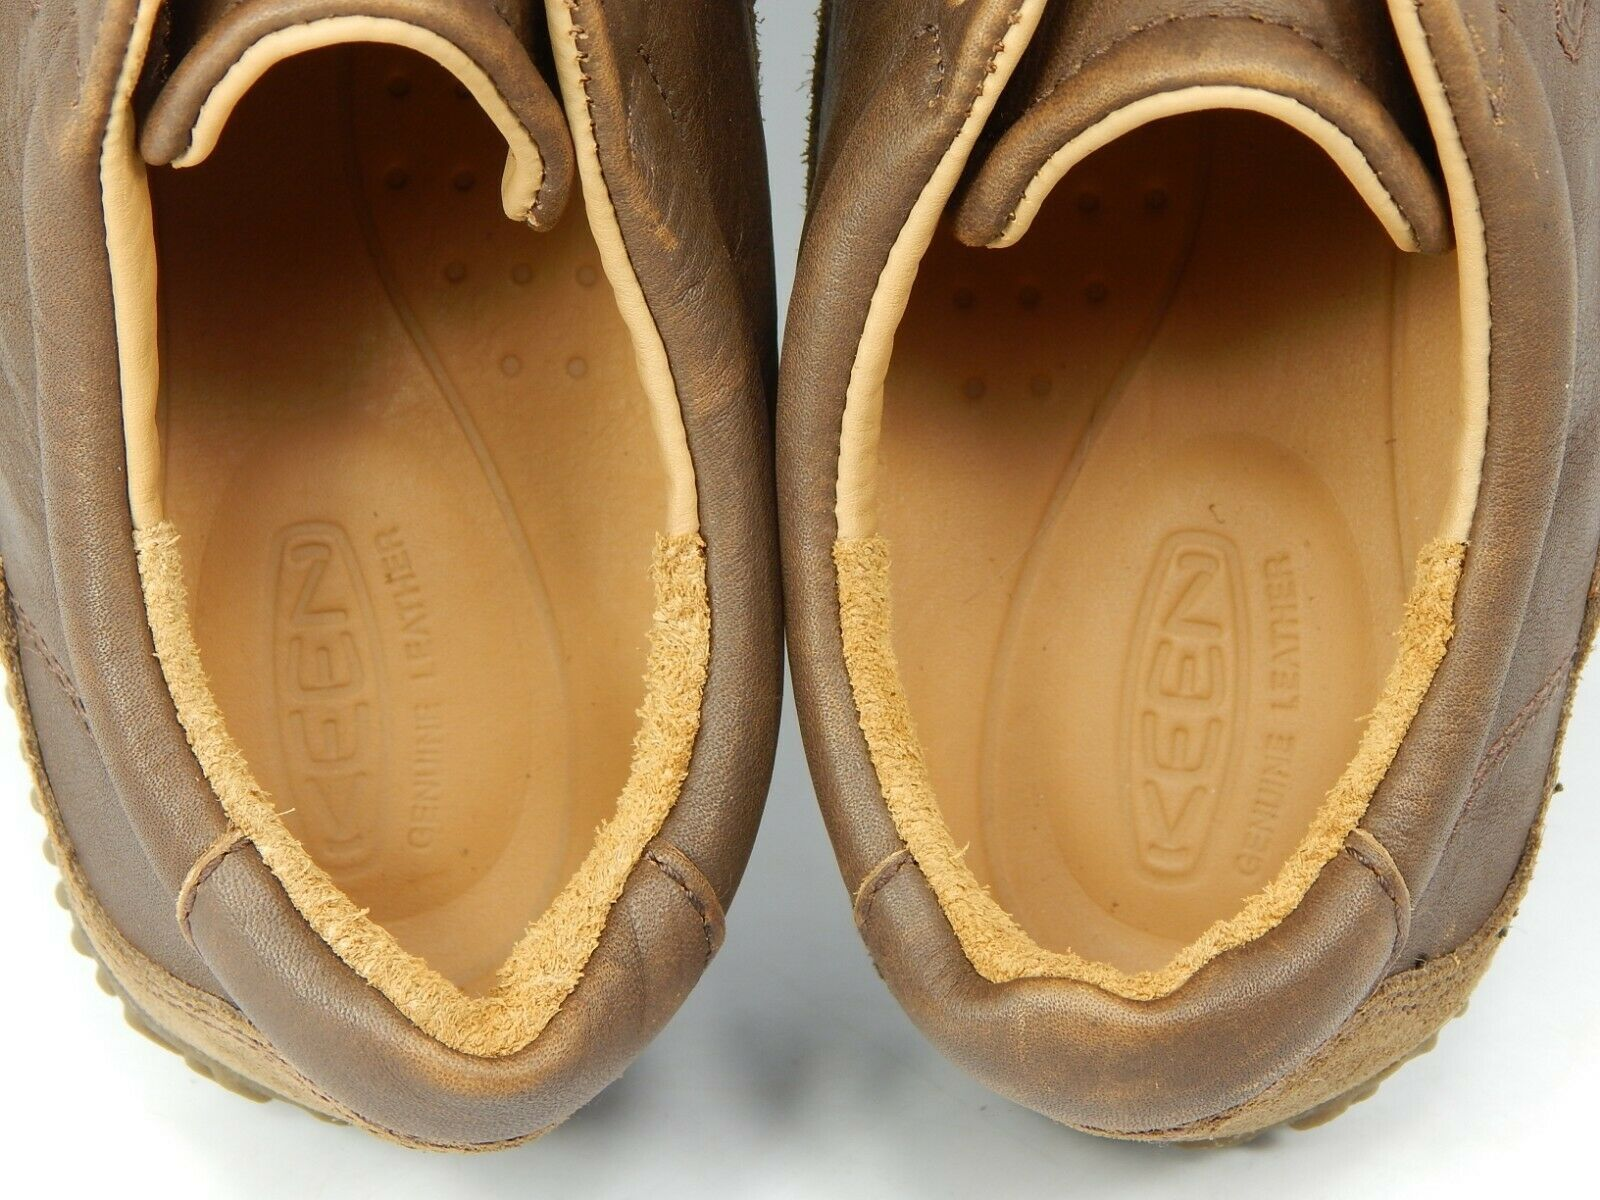 Keen Hilo Size 7.5 M (D) EU 40 Men's Lace Up Casual Shoes Dark Earth 1012454